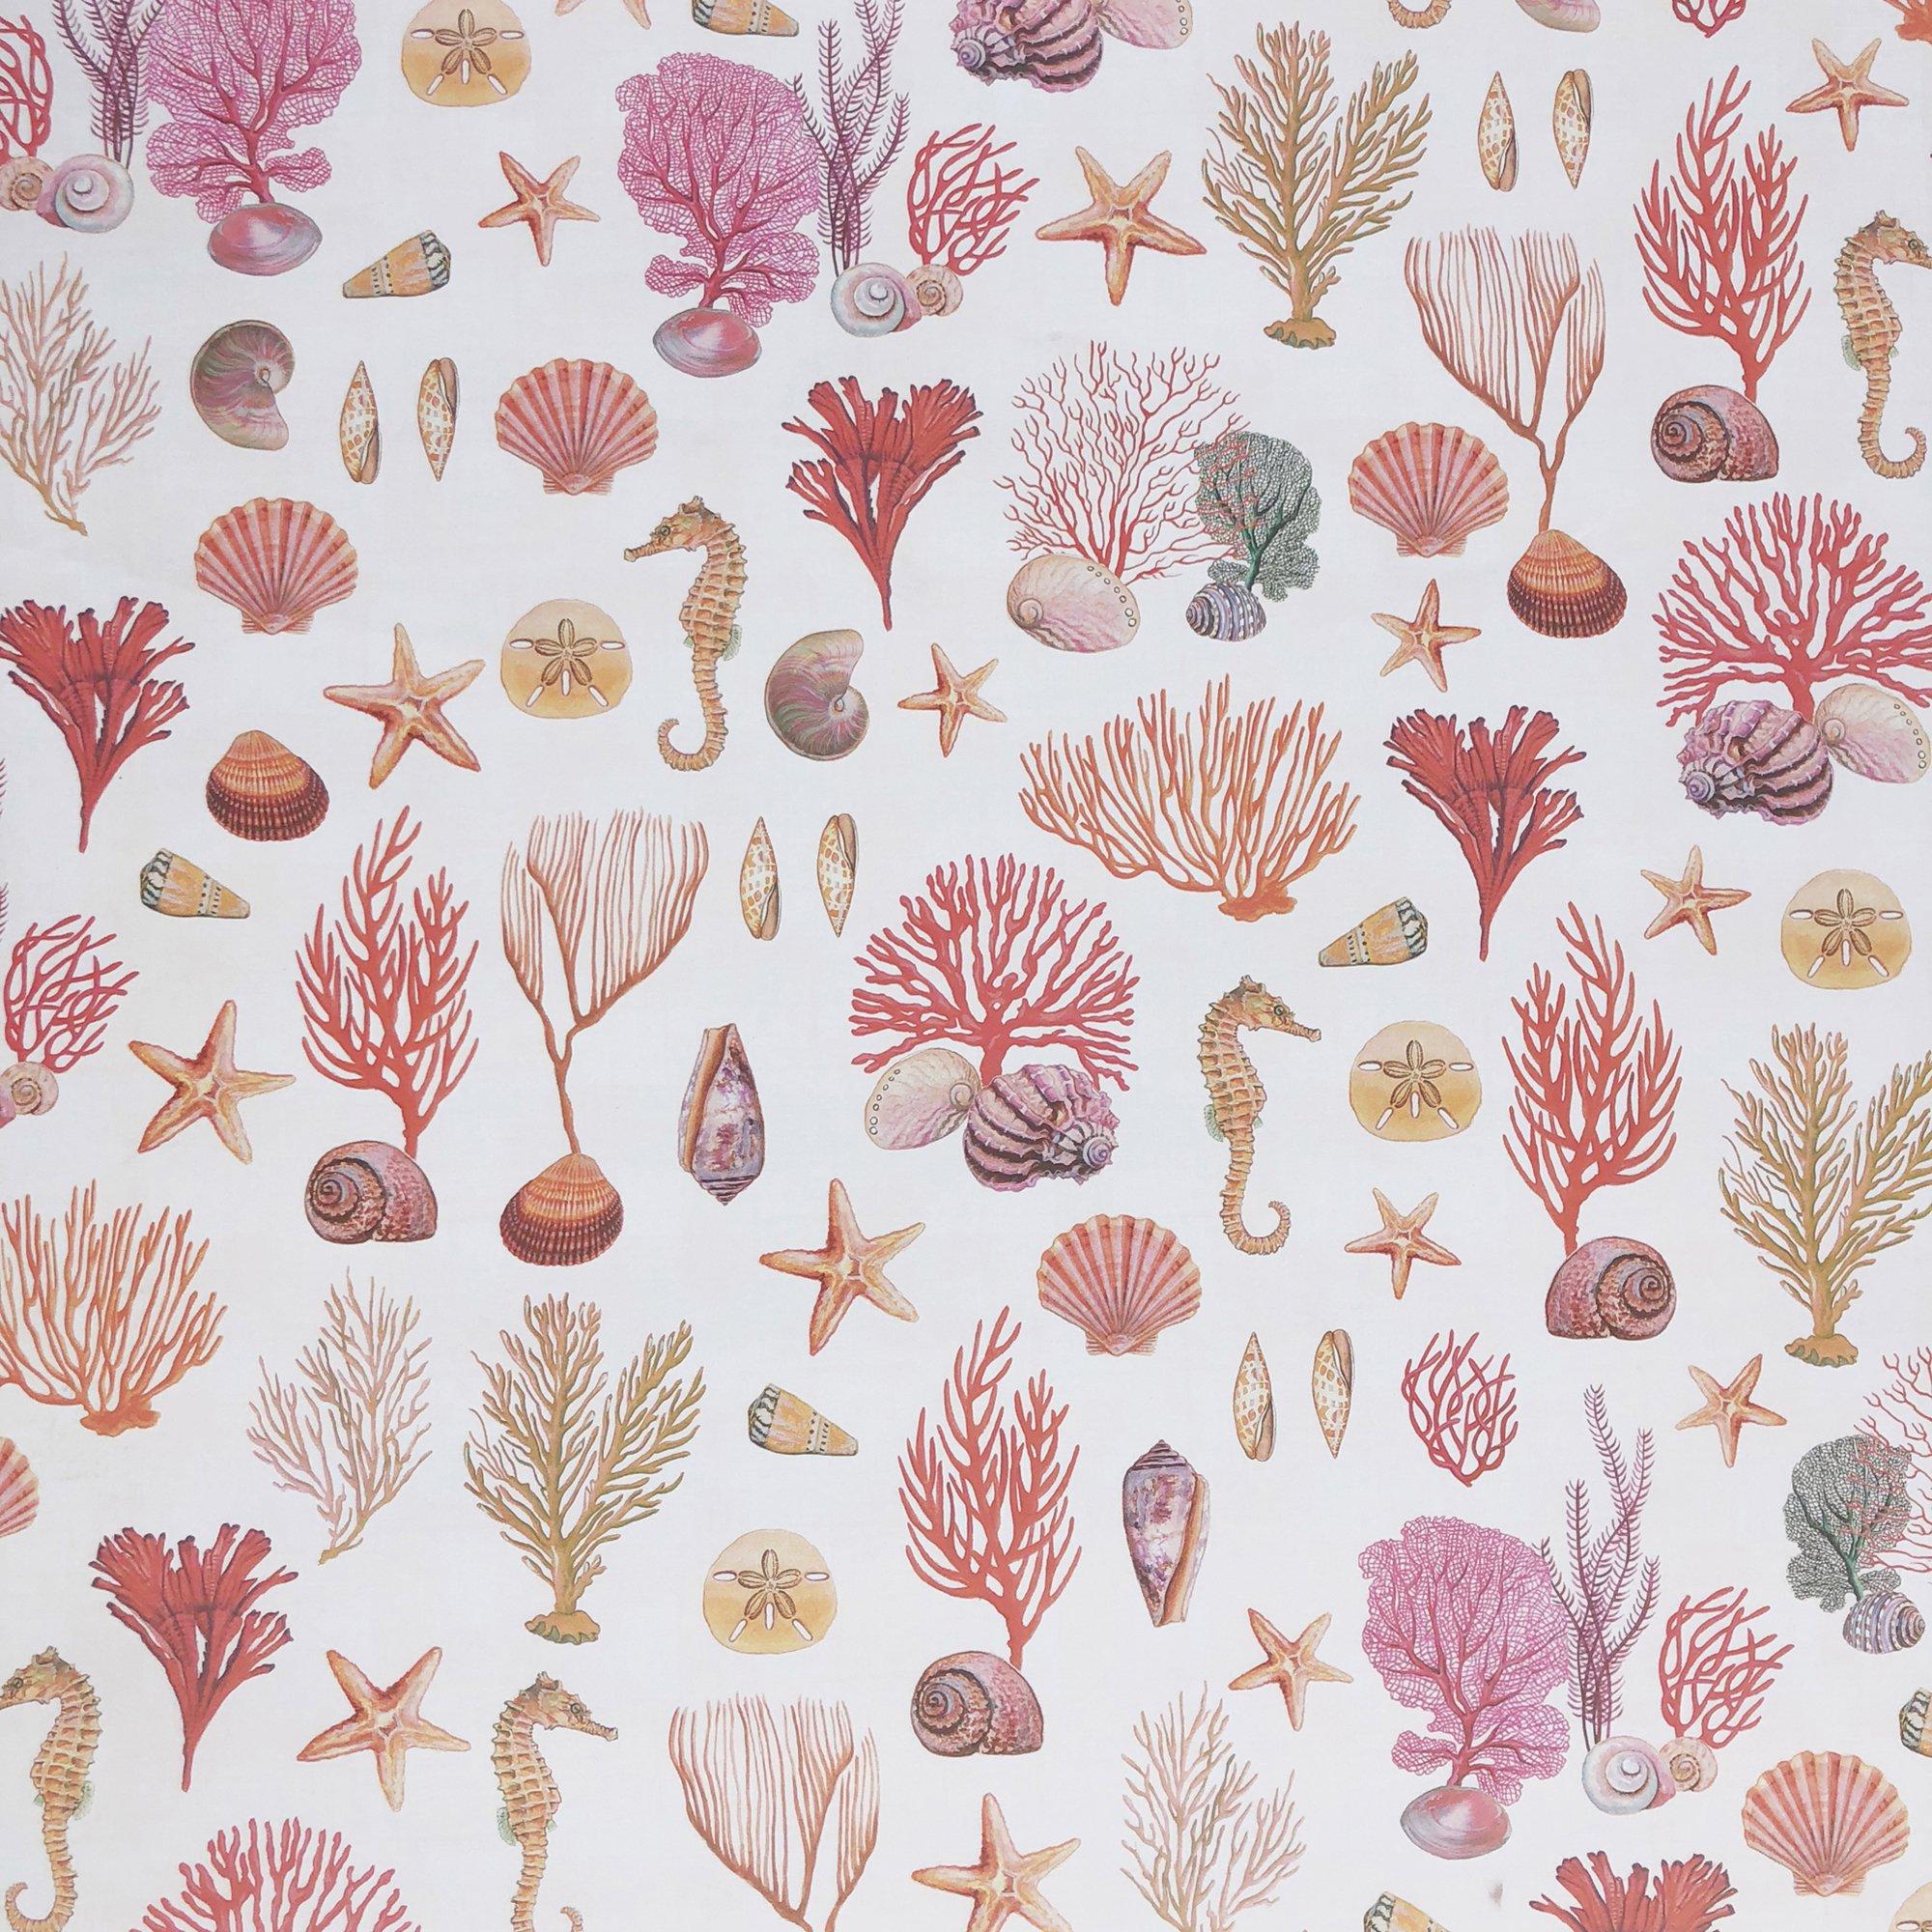 "Jillson & Roberts Gift Wrap, Coral Reef, 5' x 30"" Rolls (8 Pcs)"